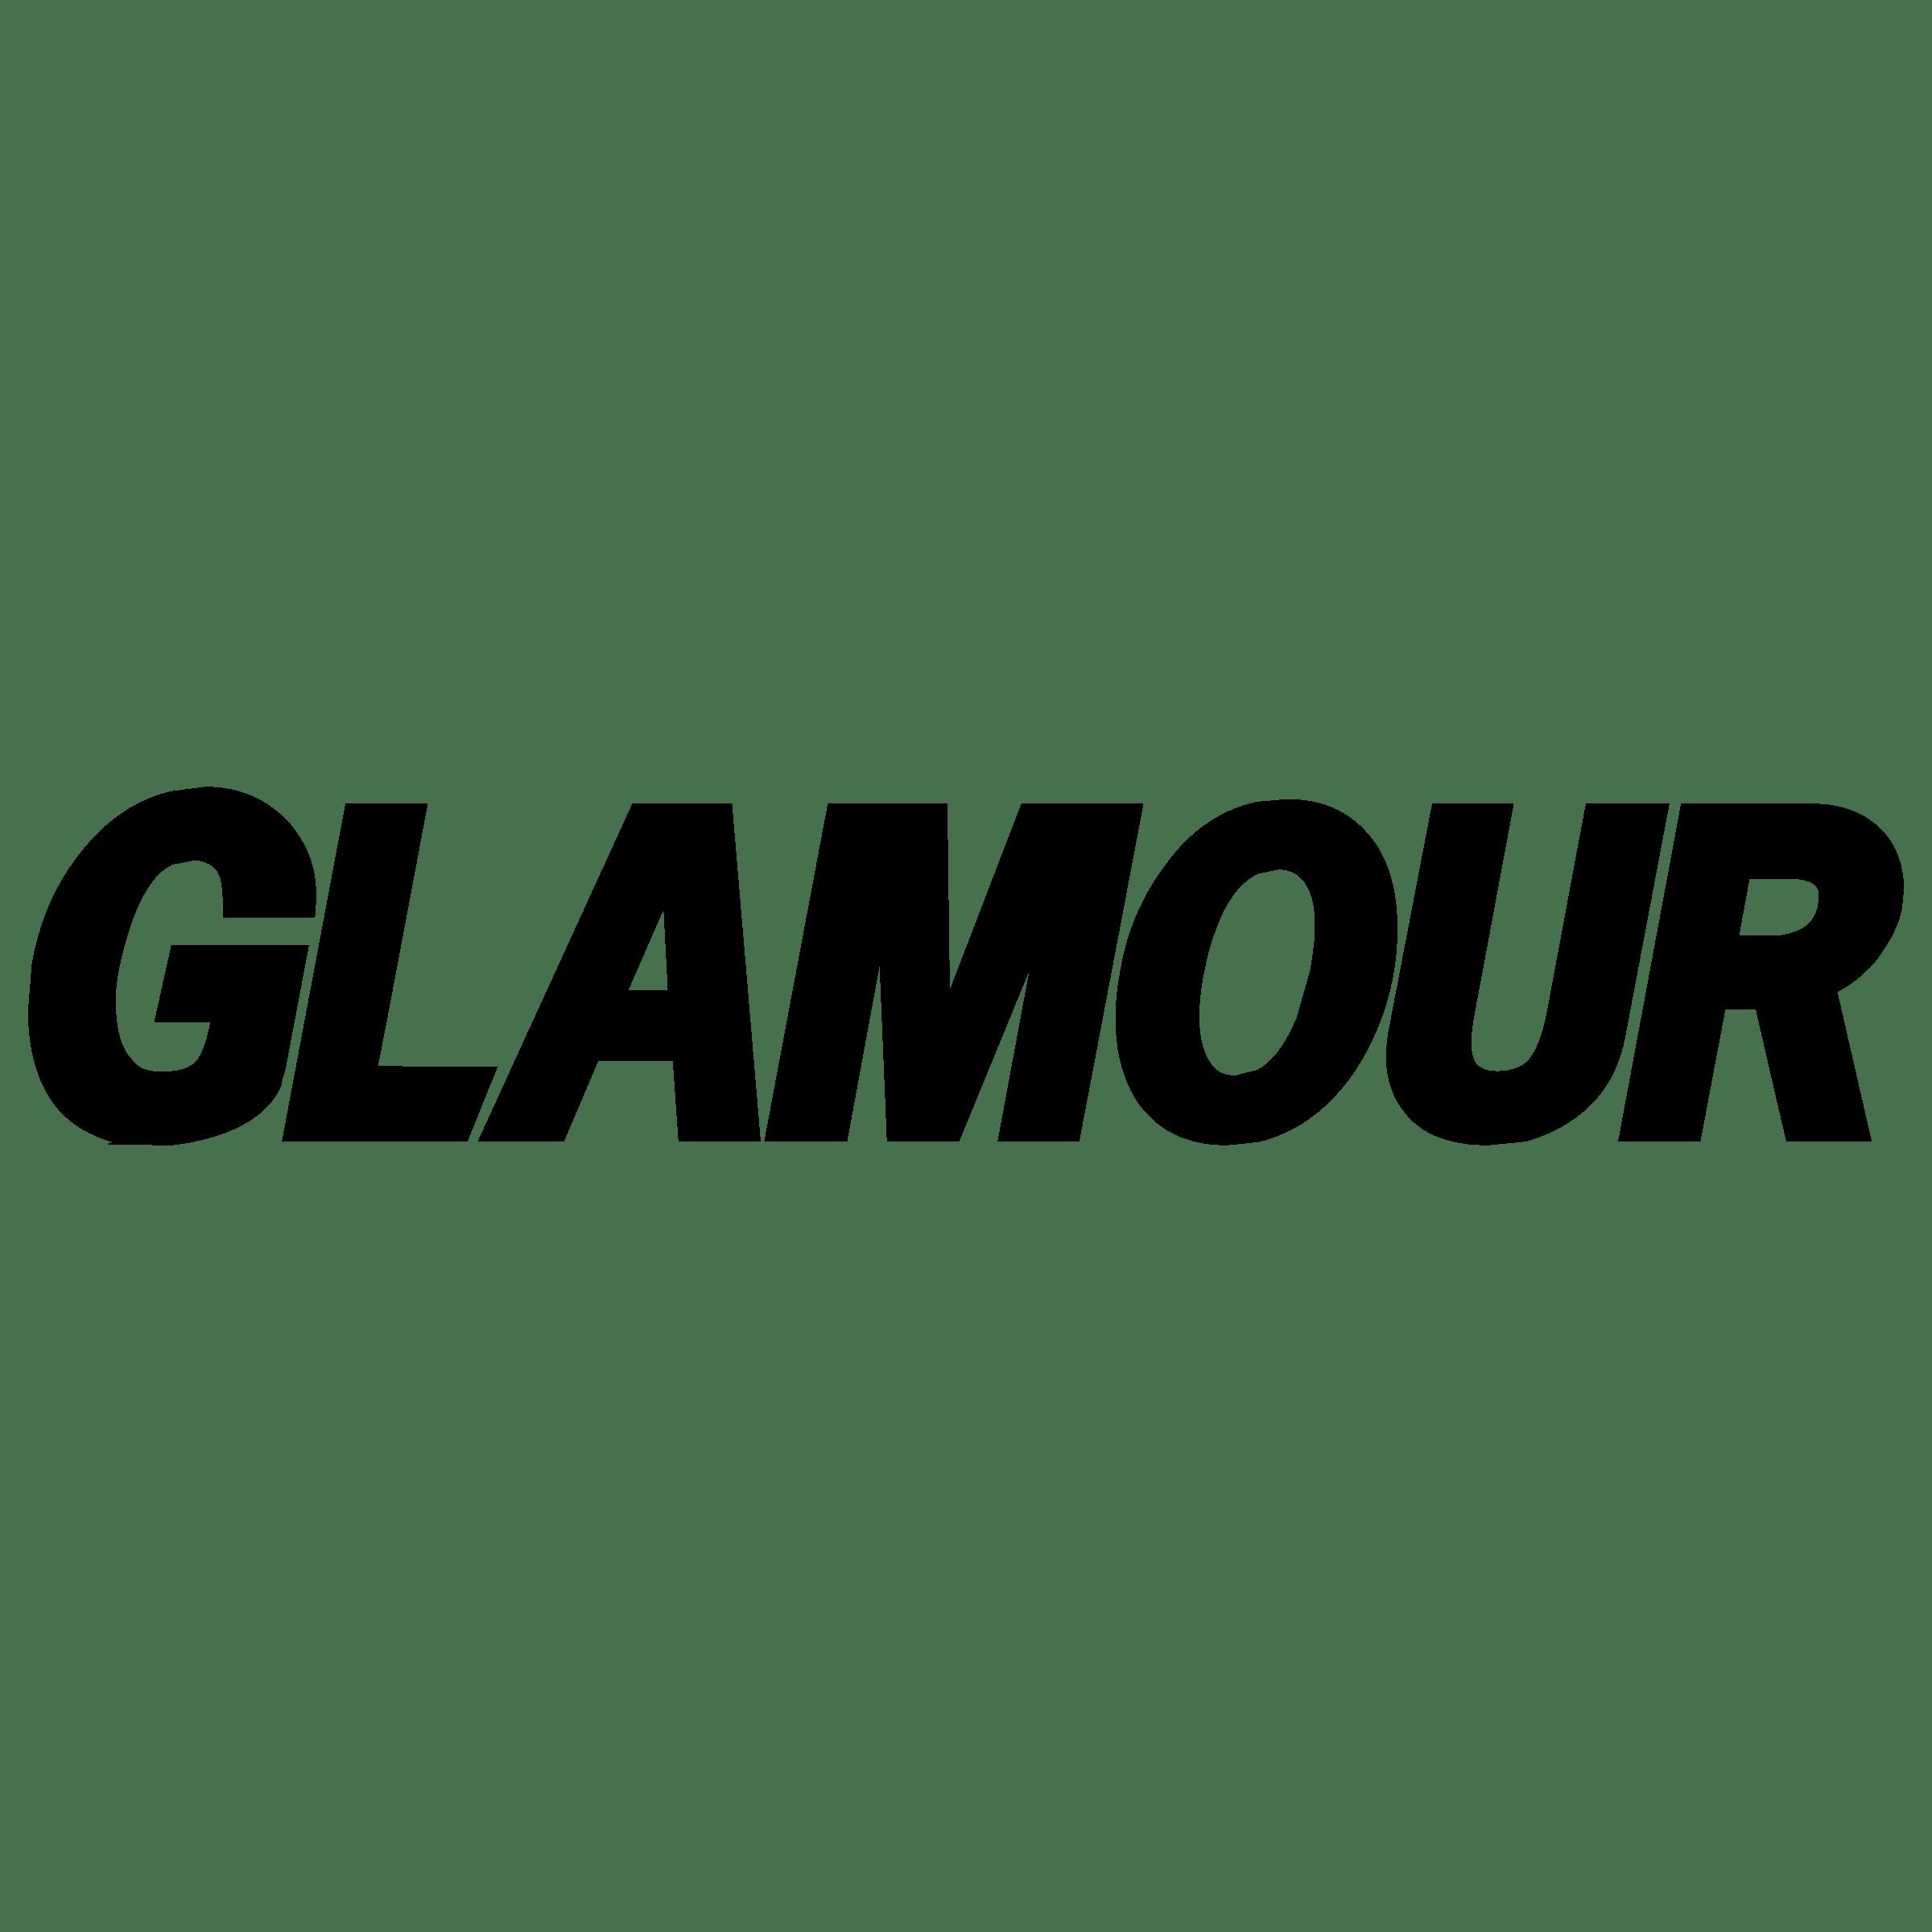 Glamour 2 Logo Png Transparent